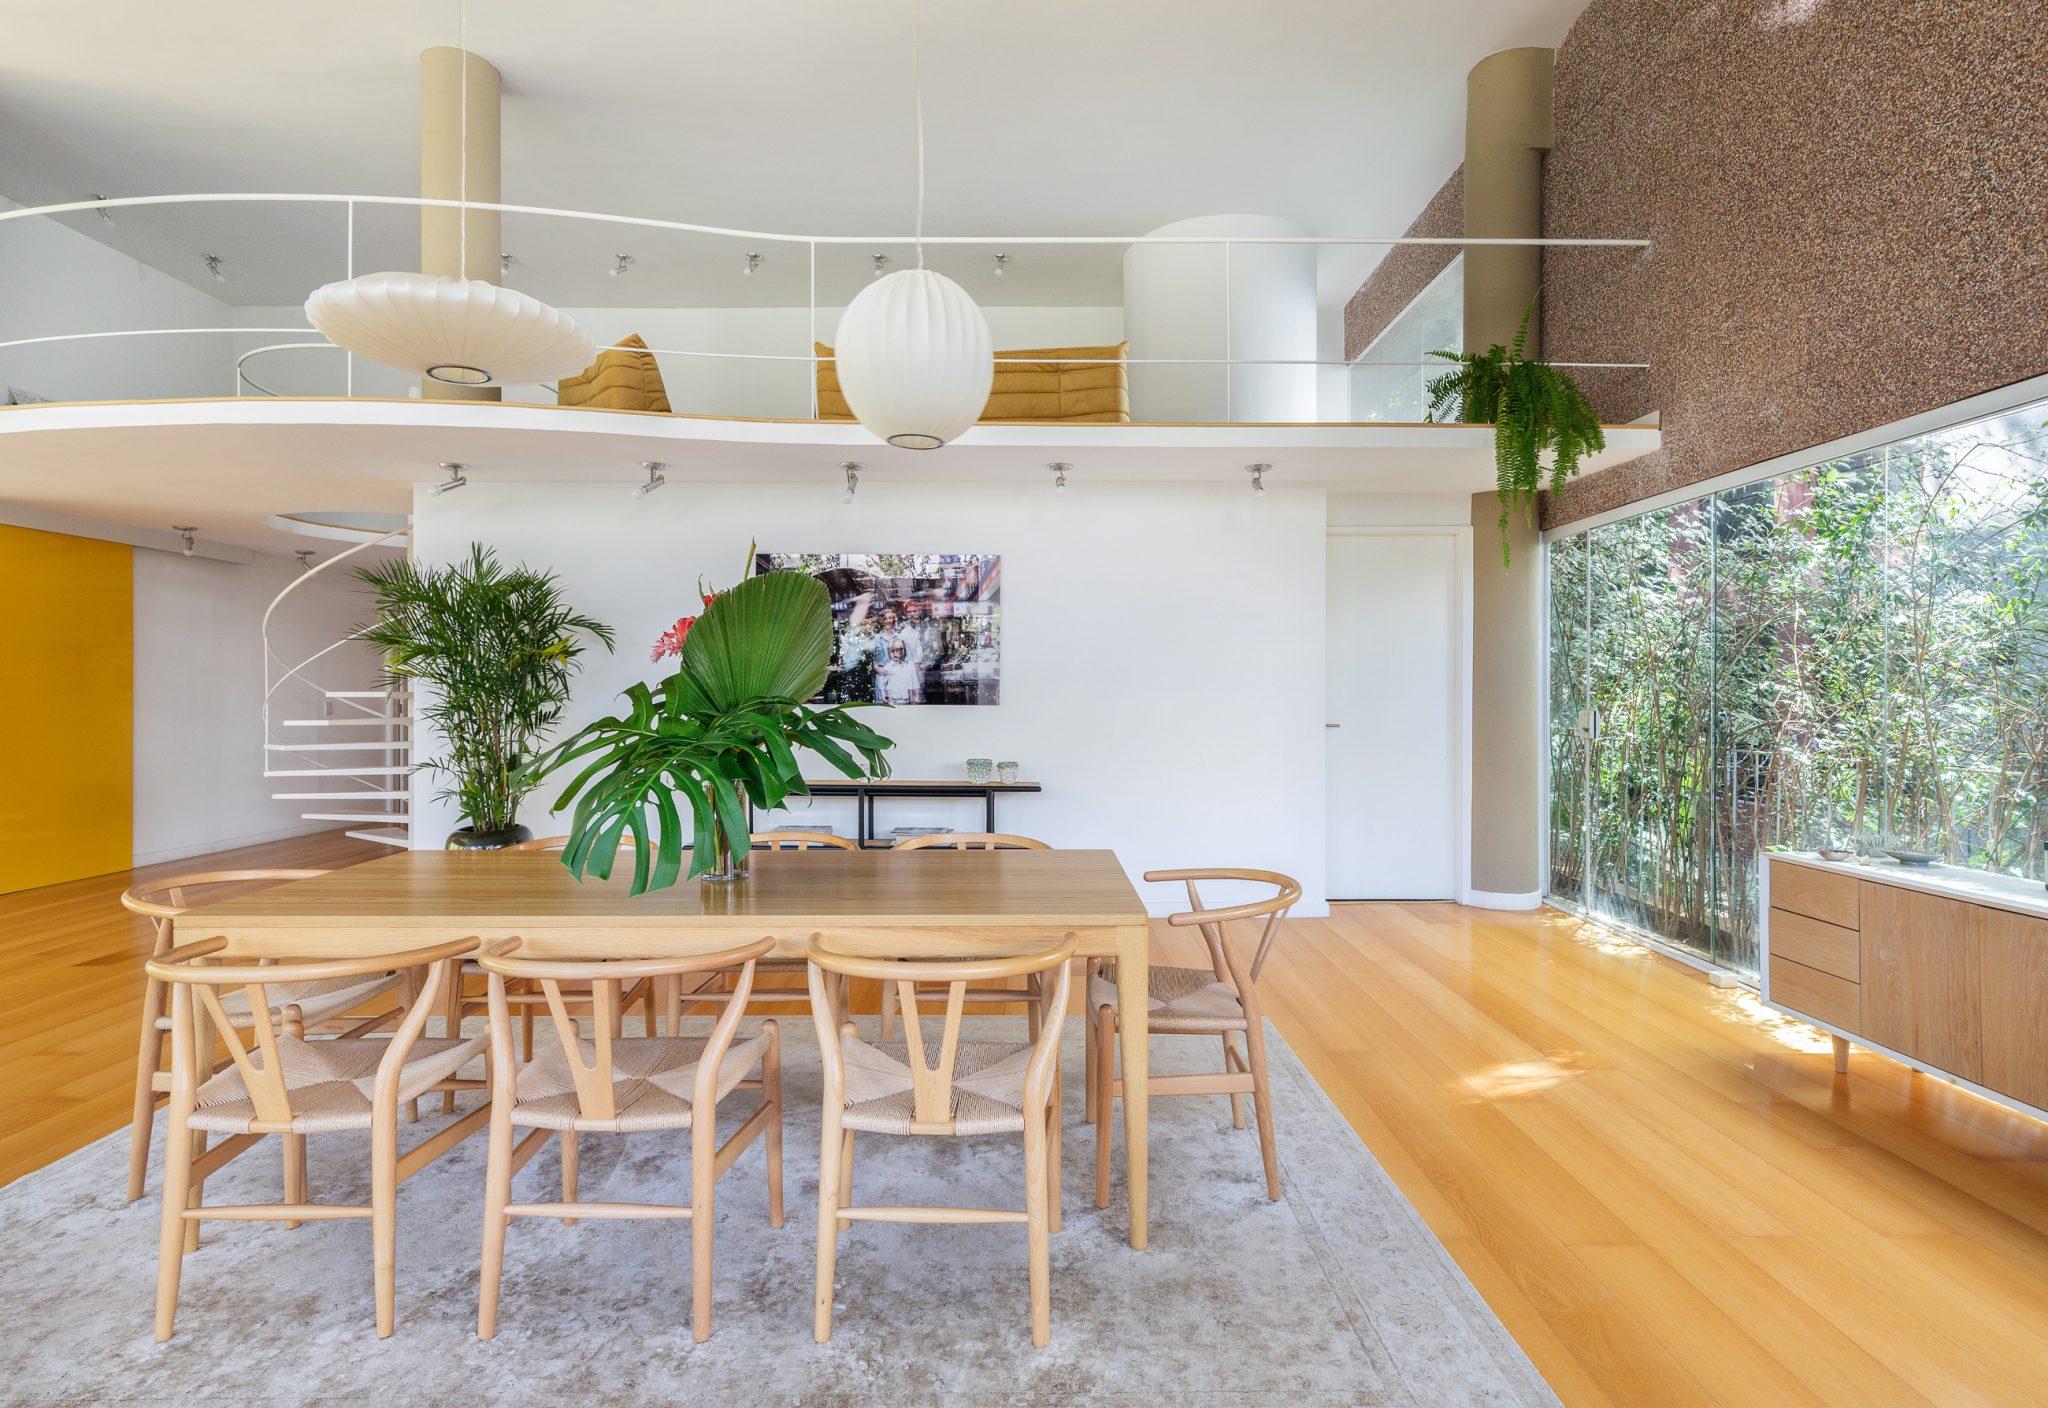 sala de jantar com piso laminado